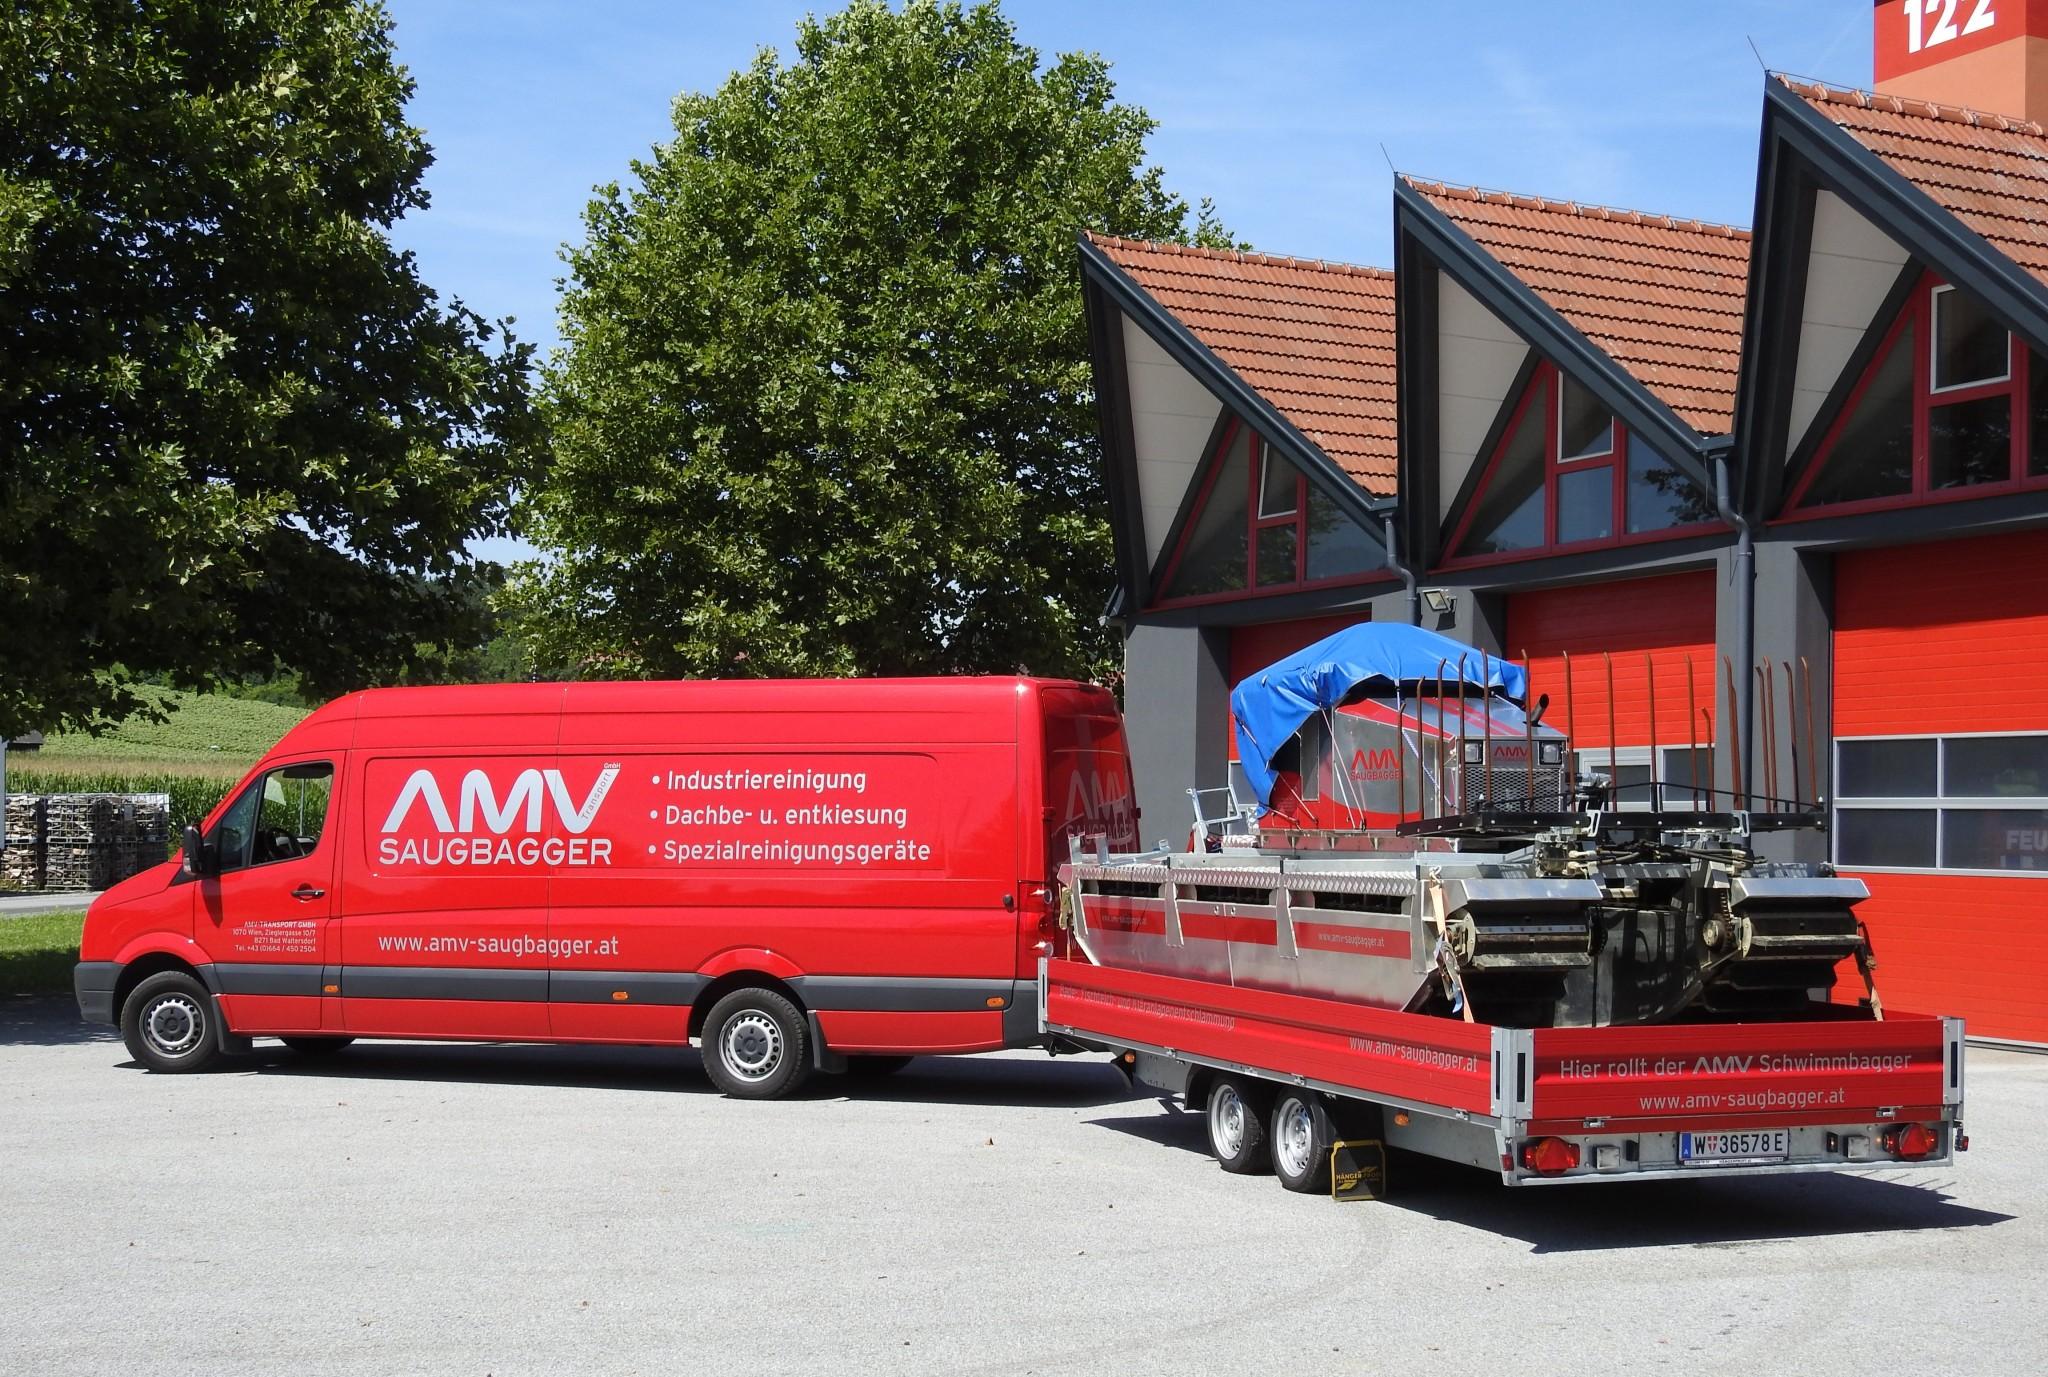 AMV Saugbagger und Schwimmbagger